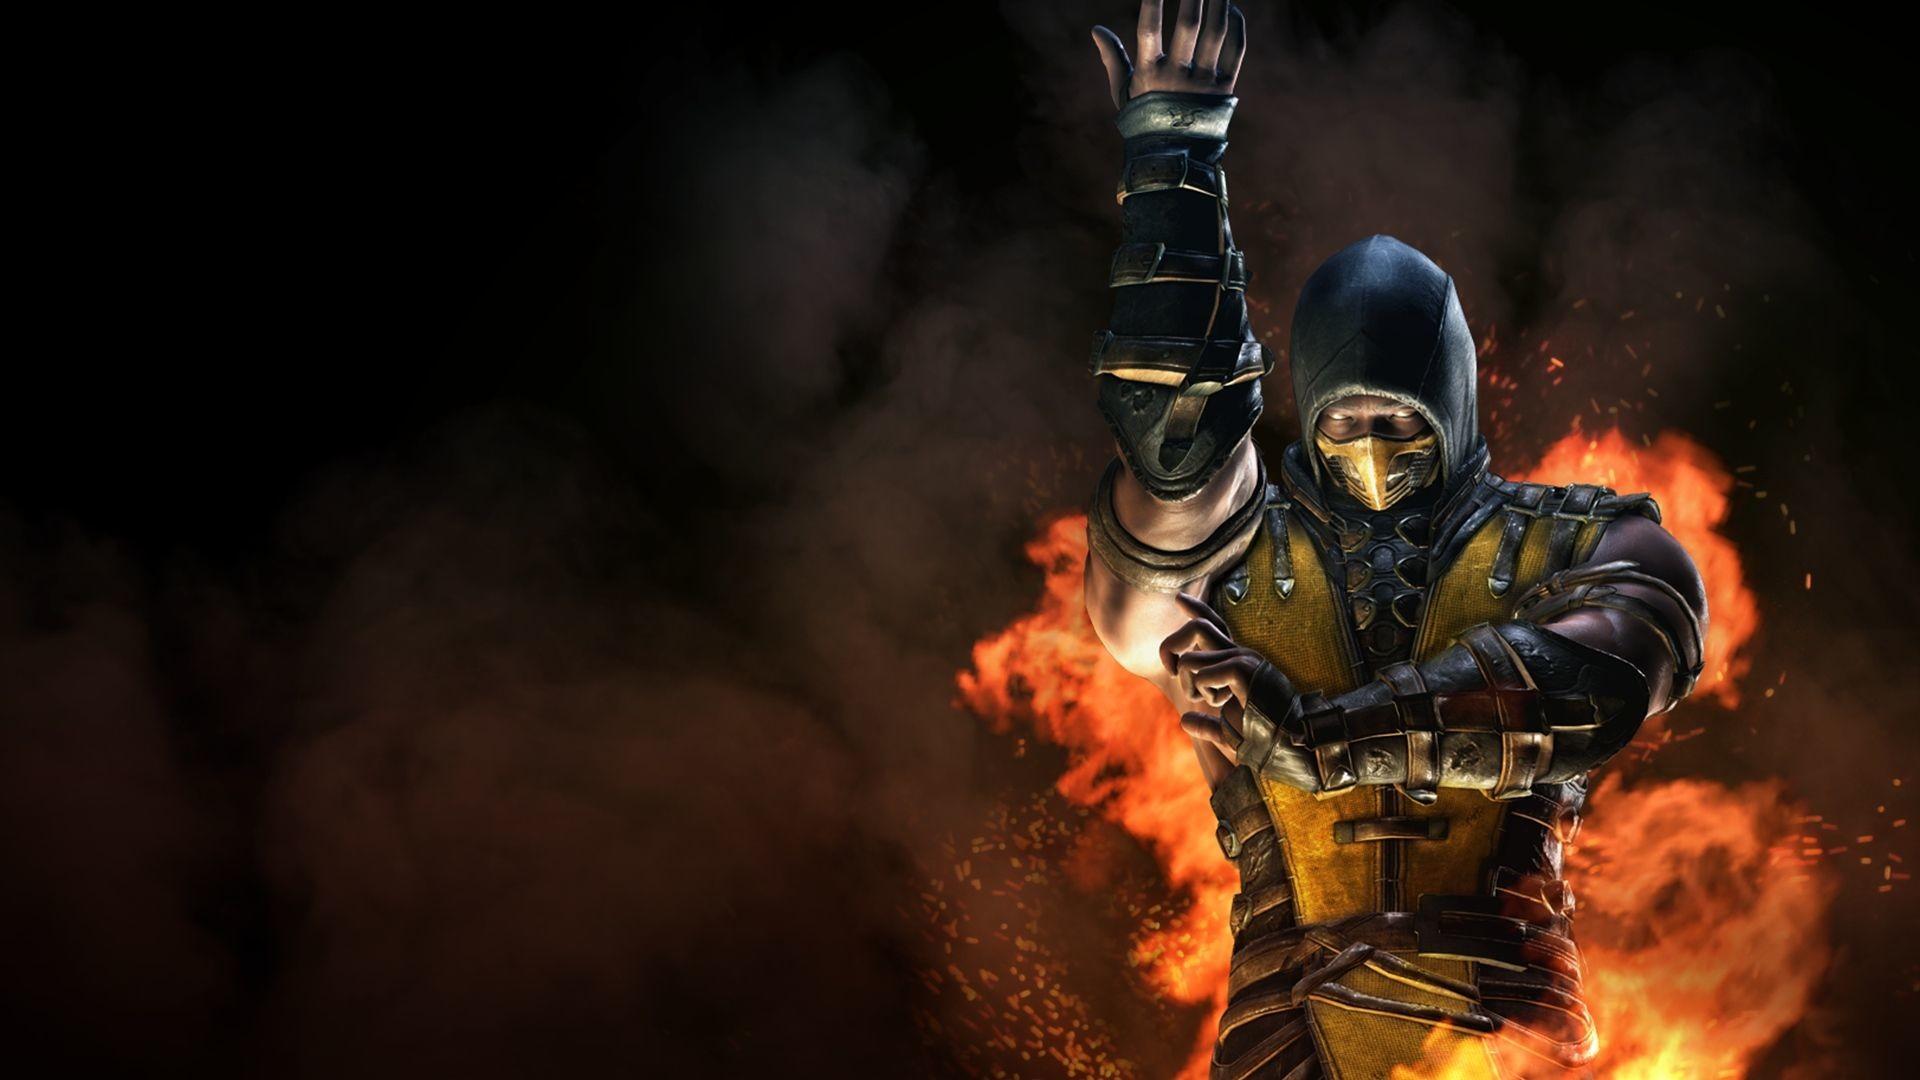 Mortal Kombat Wallpaper Hd 78 Pictures